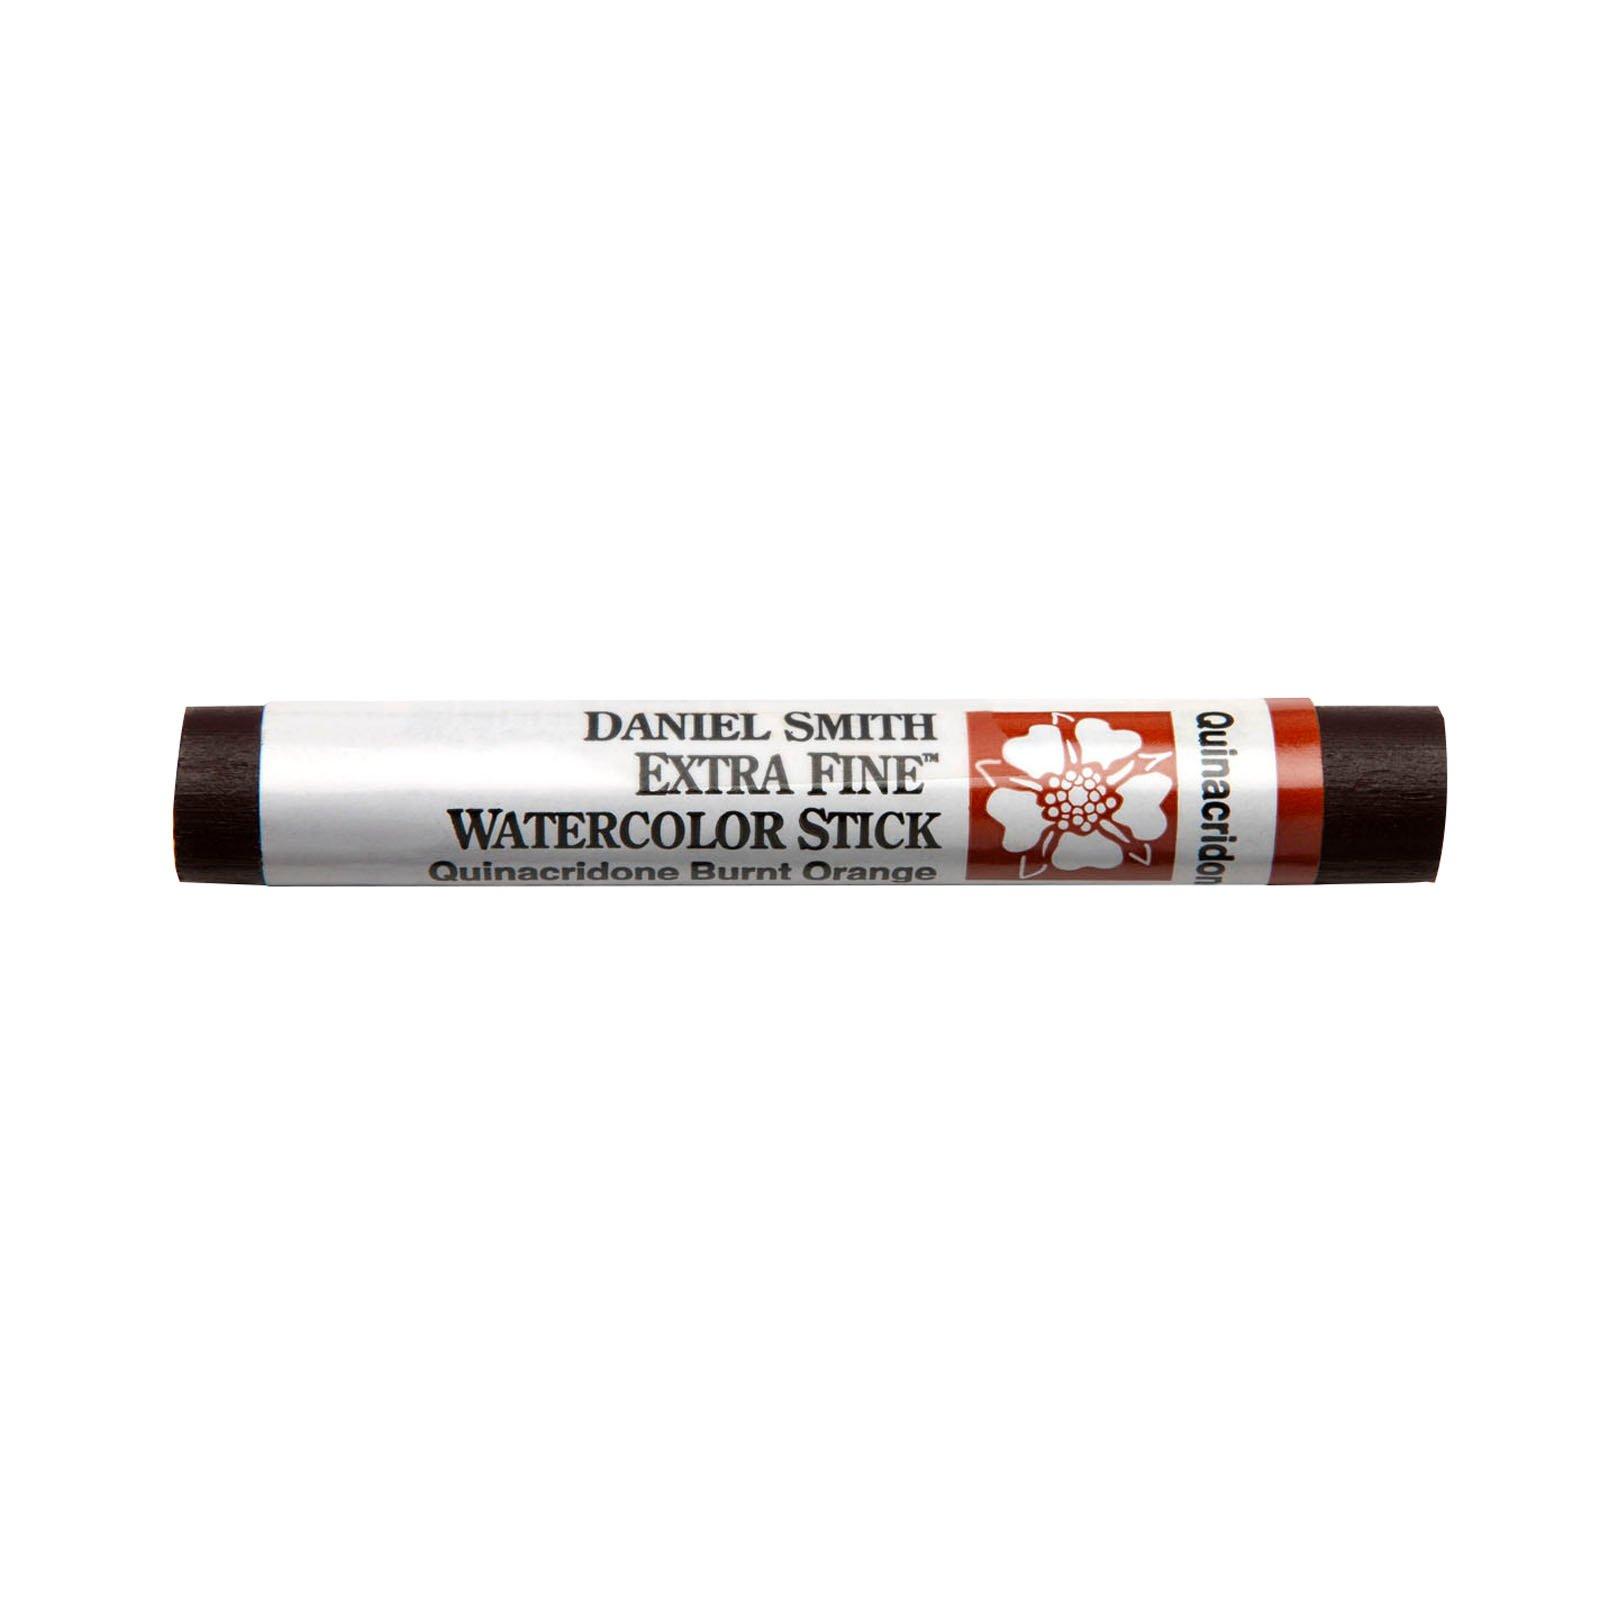 Extra-Fine Watercolor Sticks, Quinacridone Burnt Orange - 12ml Stick